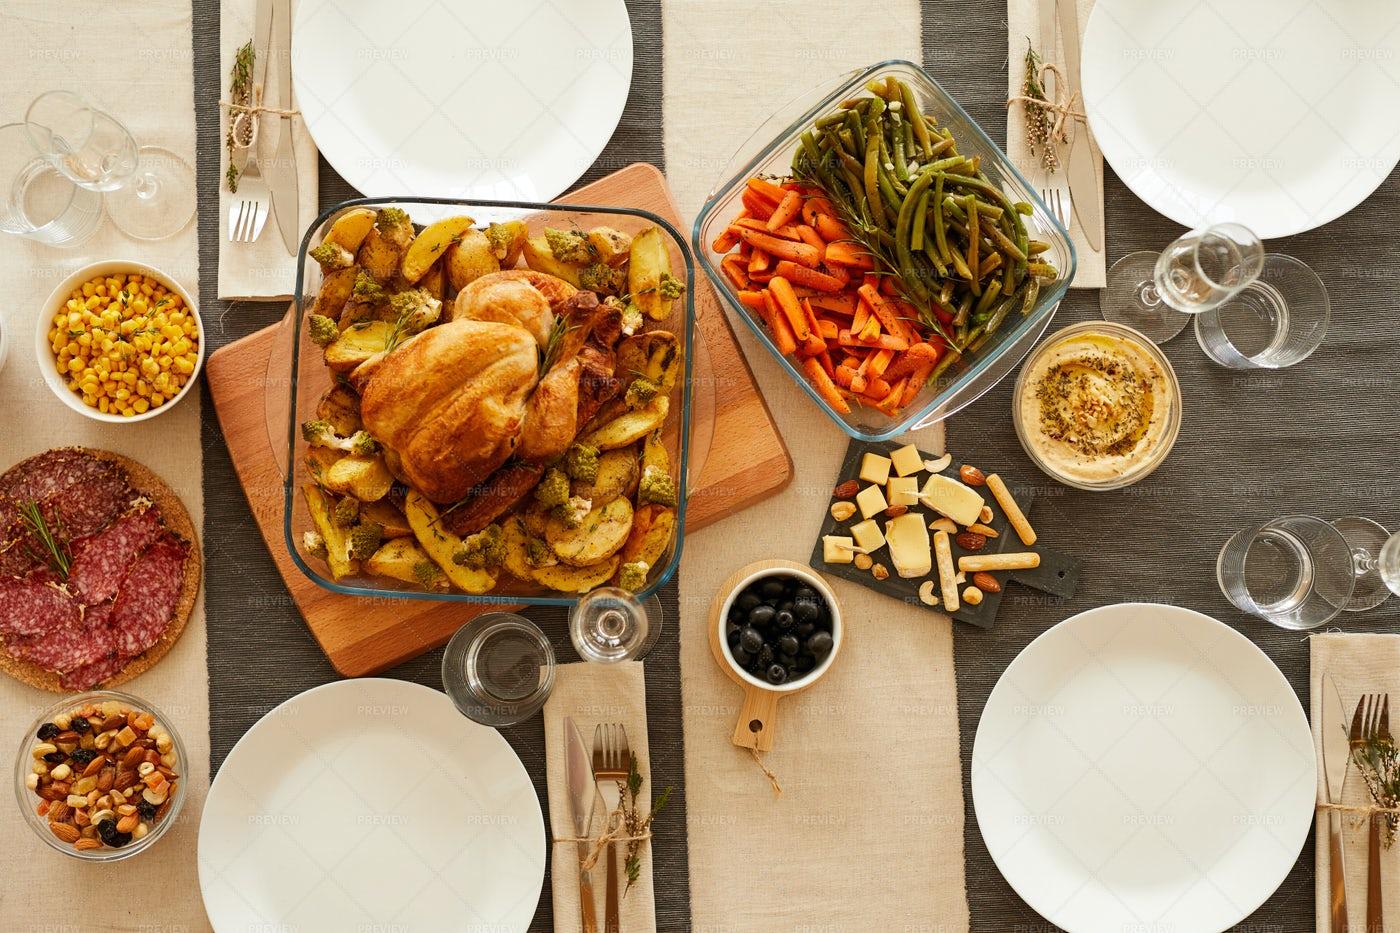 Roast Turkey For Thanksgiving: Stock Photos